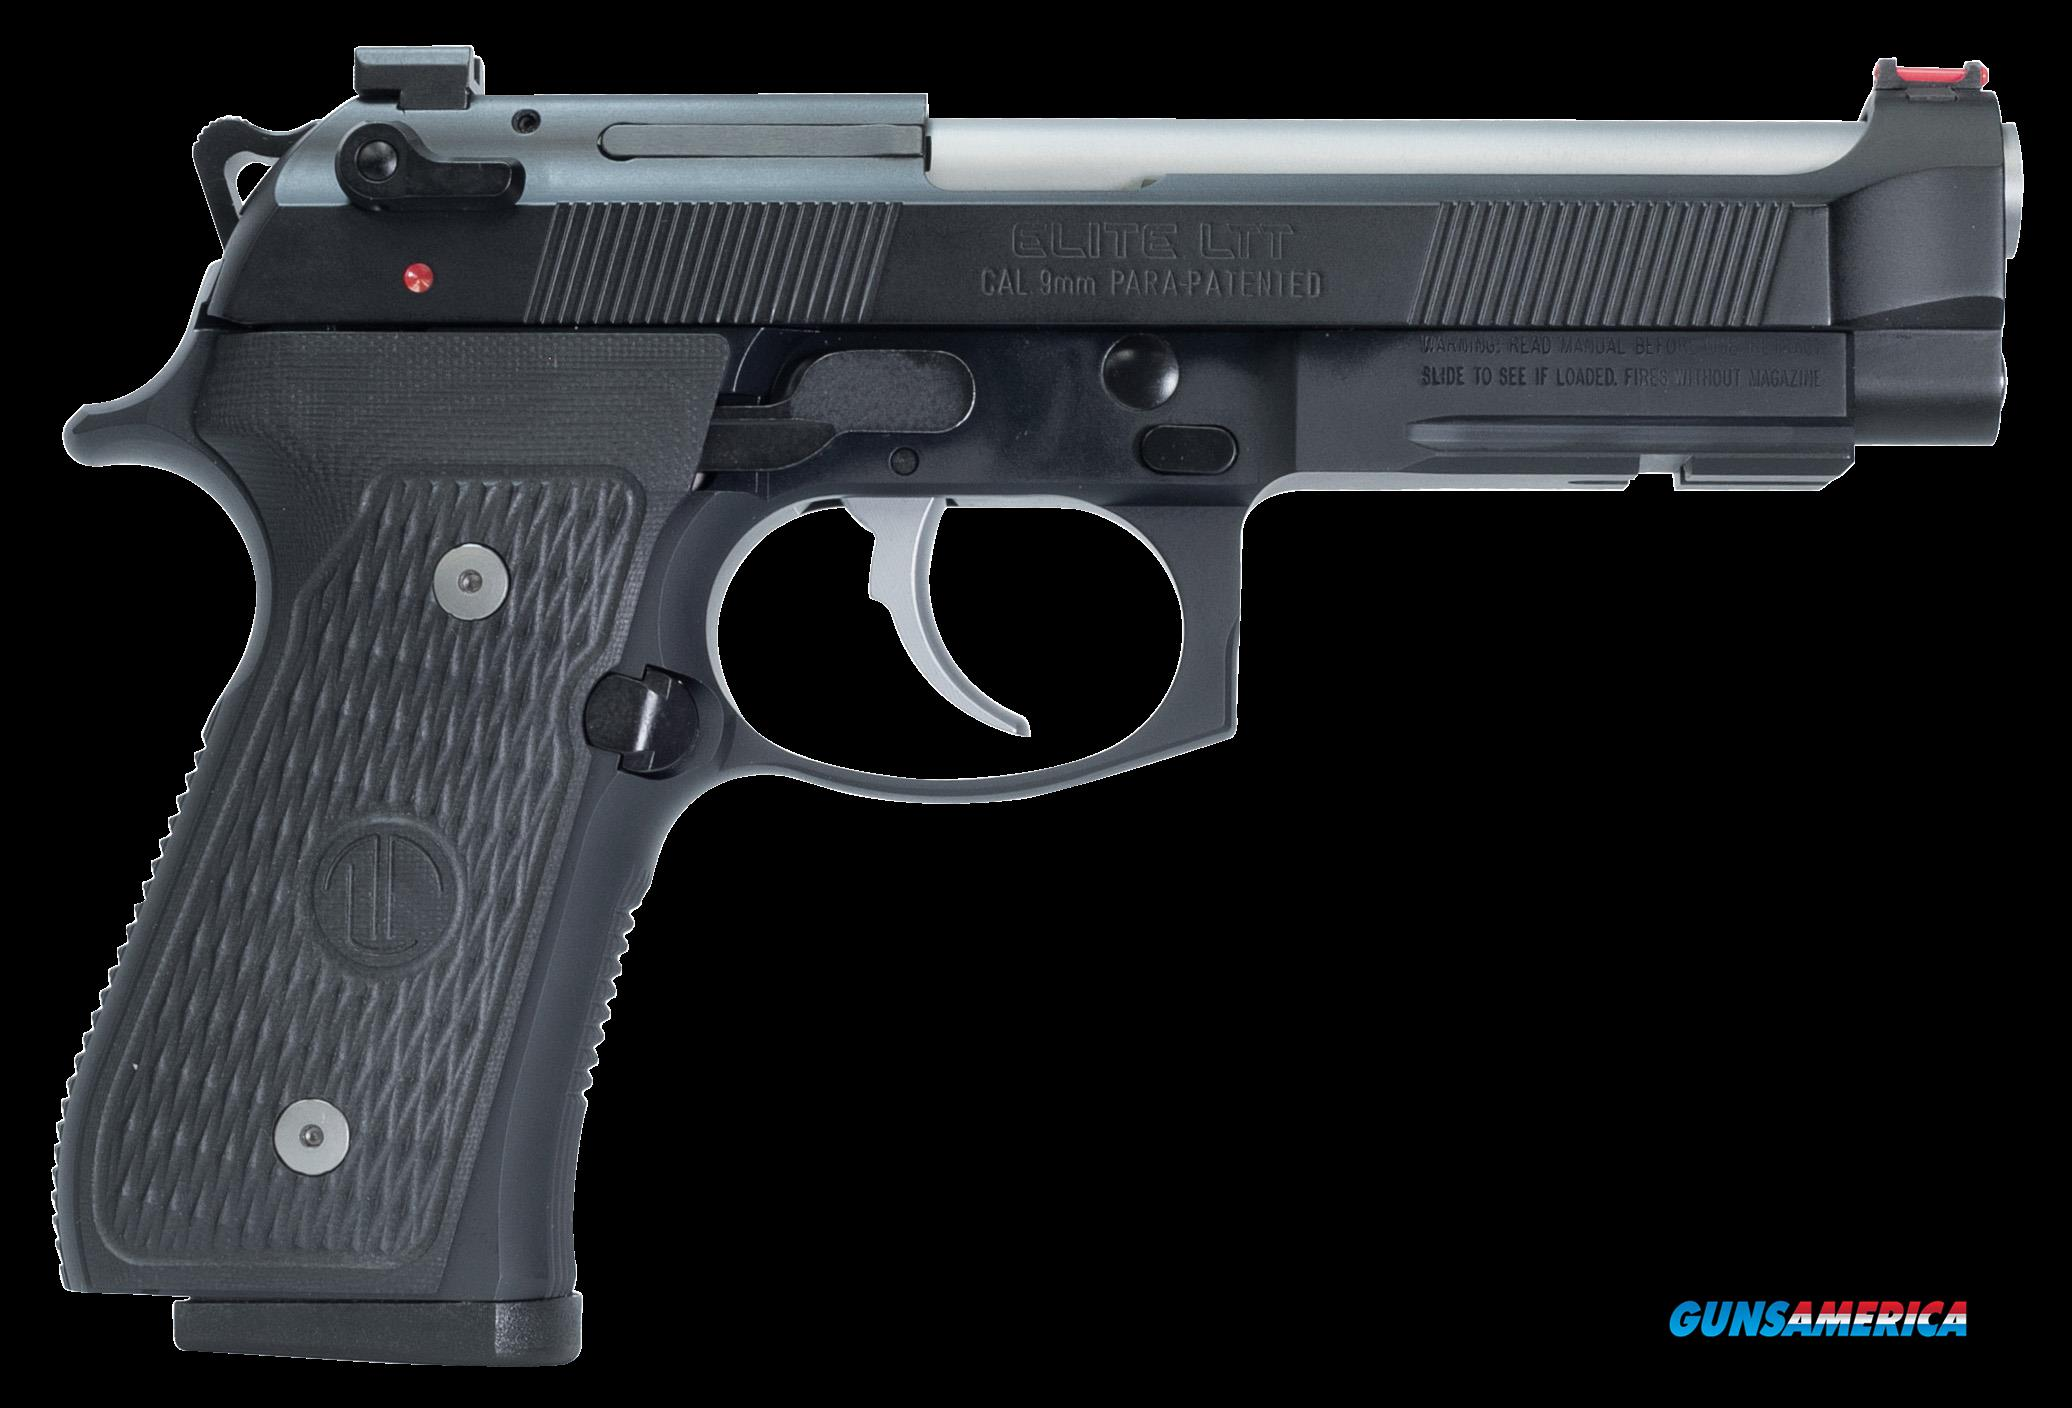 Beretta Usa 92g, Ber J92g9lttm  Elite Ltt  9mm         15rd  Guns > Pistols > 1911 Pistol Copies (non-Colt)